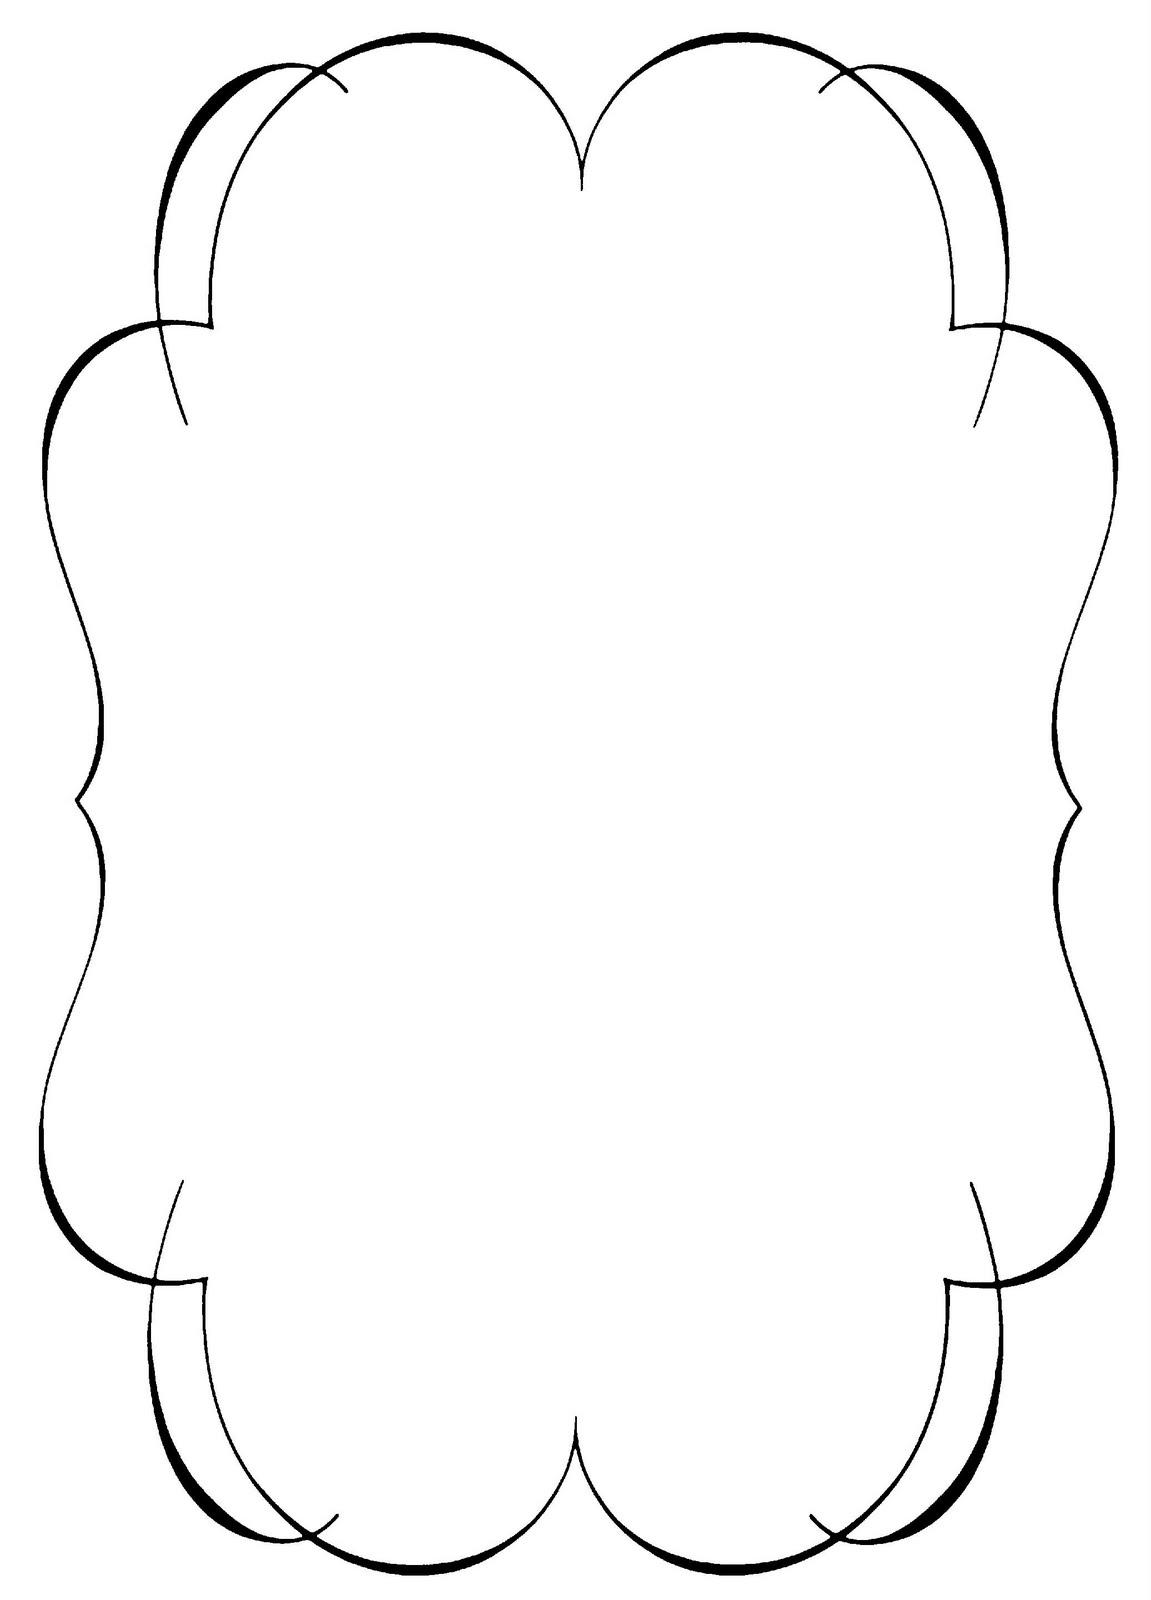 Bracket Frame Clipart% .-bracket frame clipart% .-3